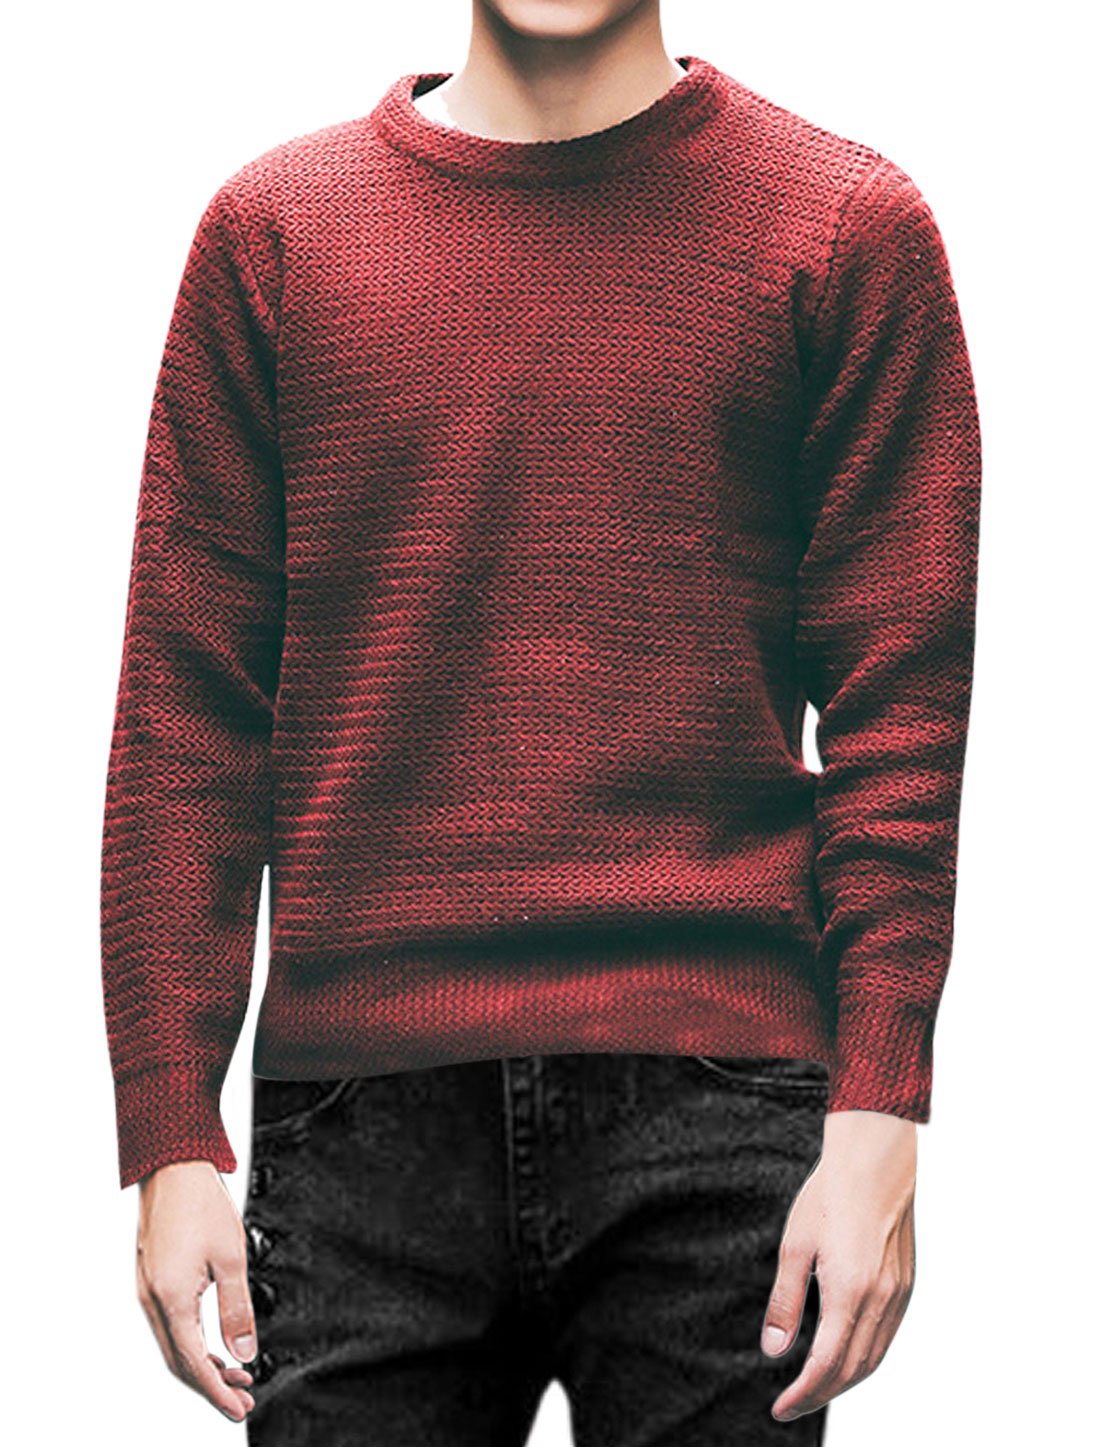 Men Long Sleeve Round Neck Slim Fit Zipper Sides Sweaters Burgundy M